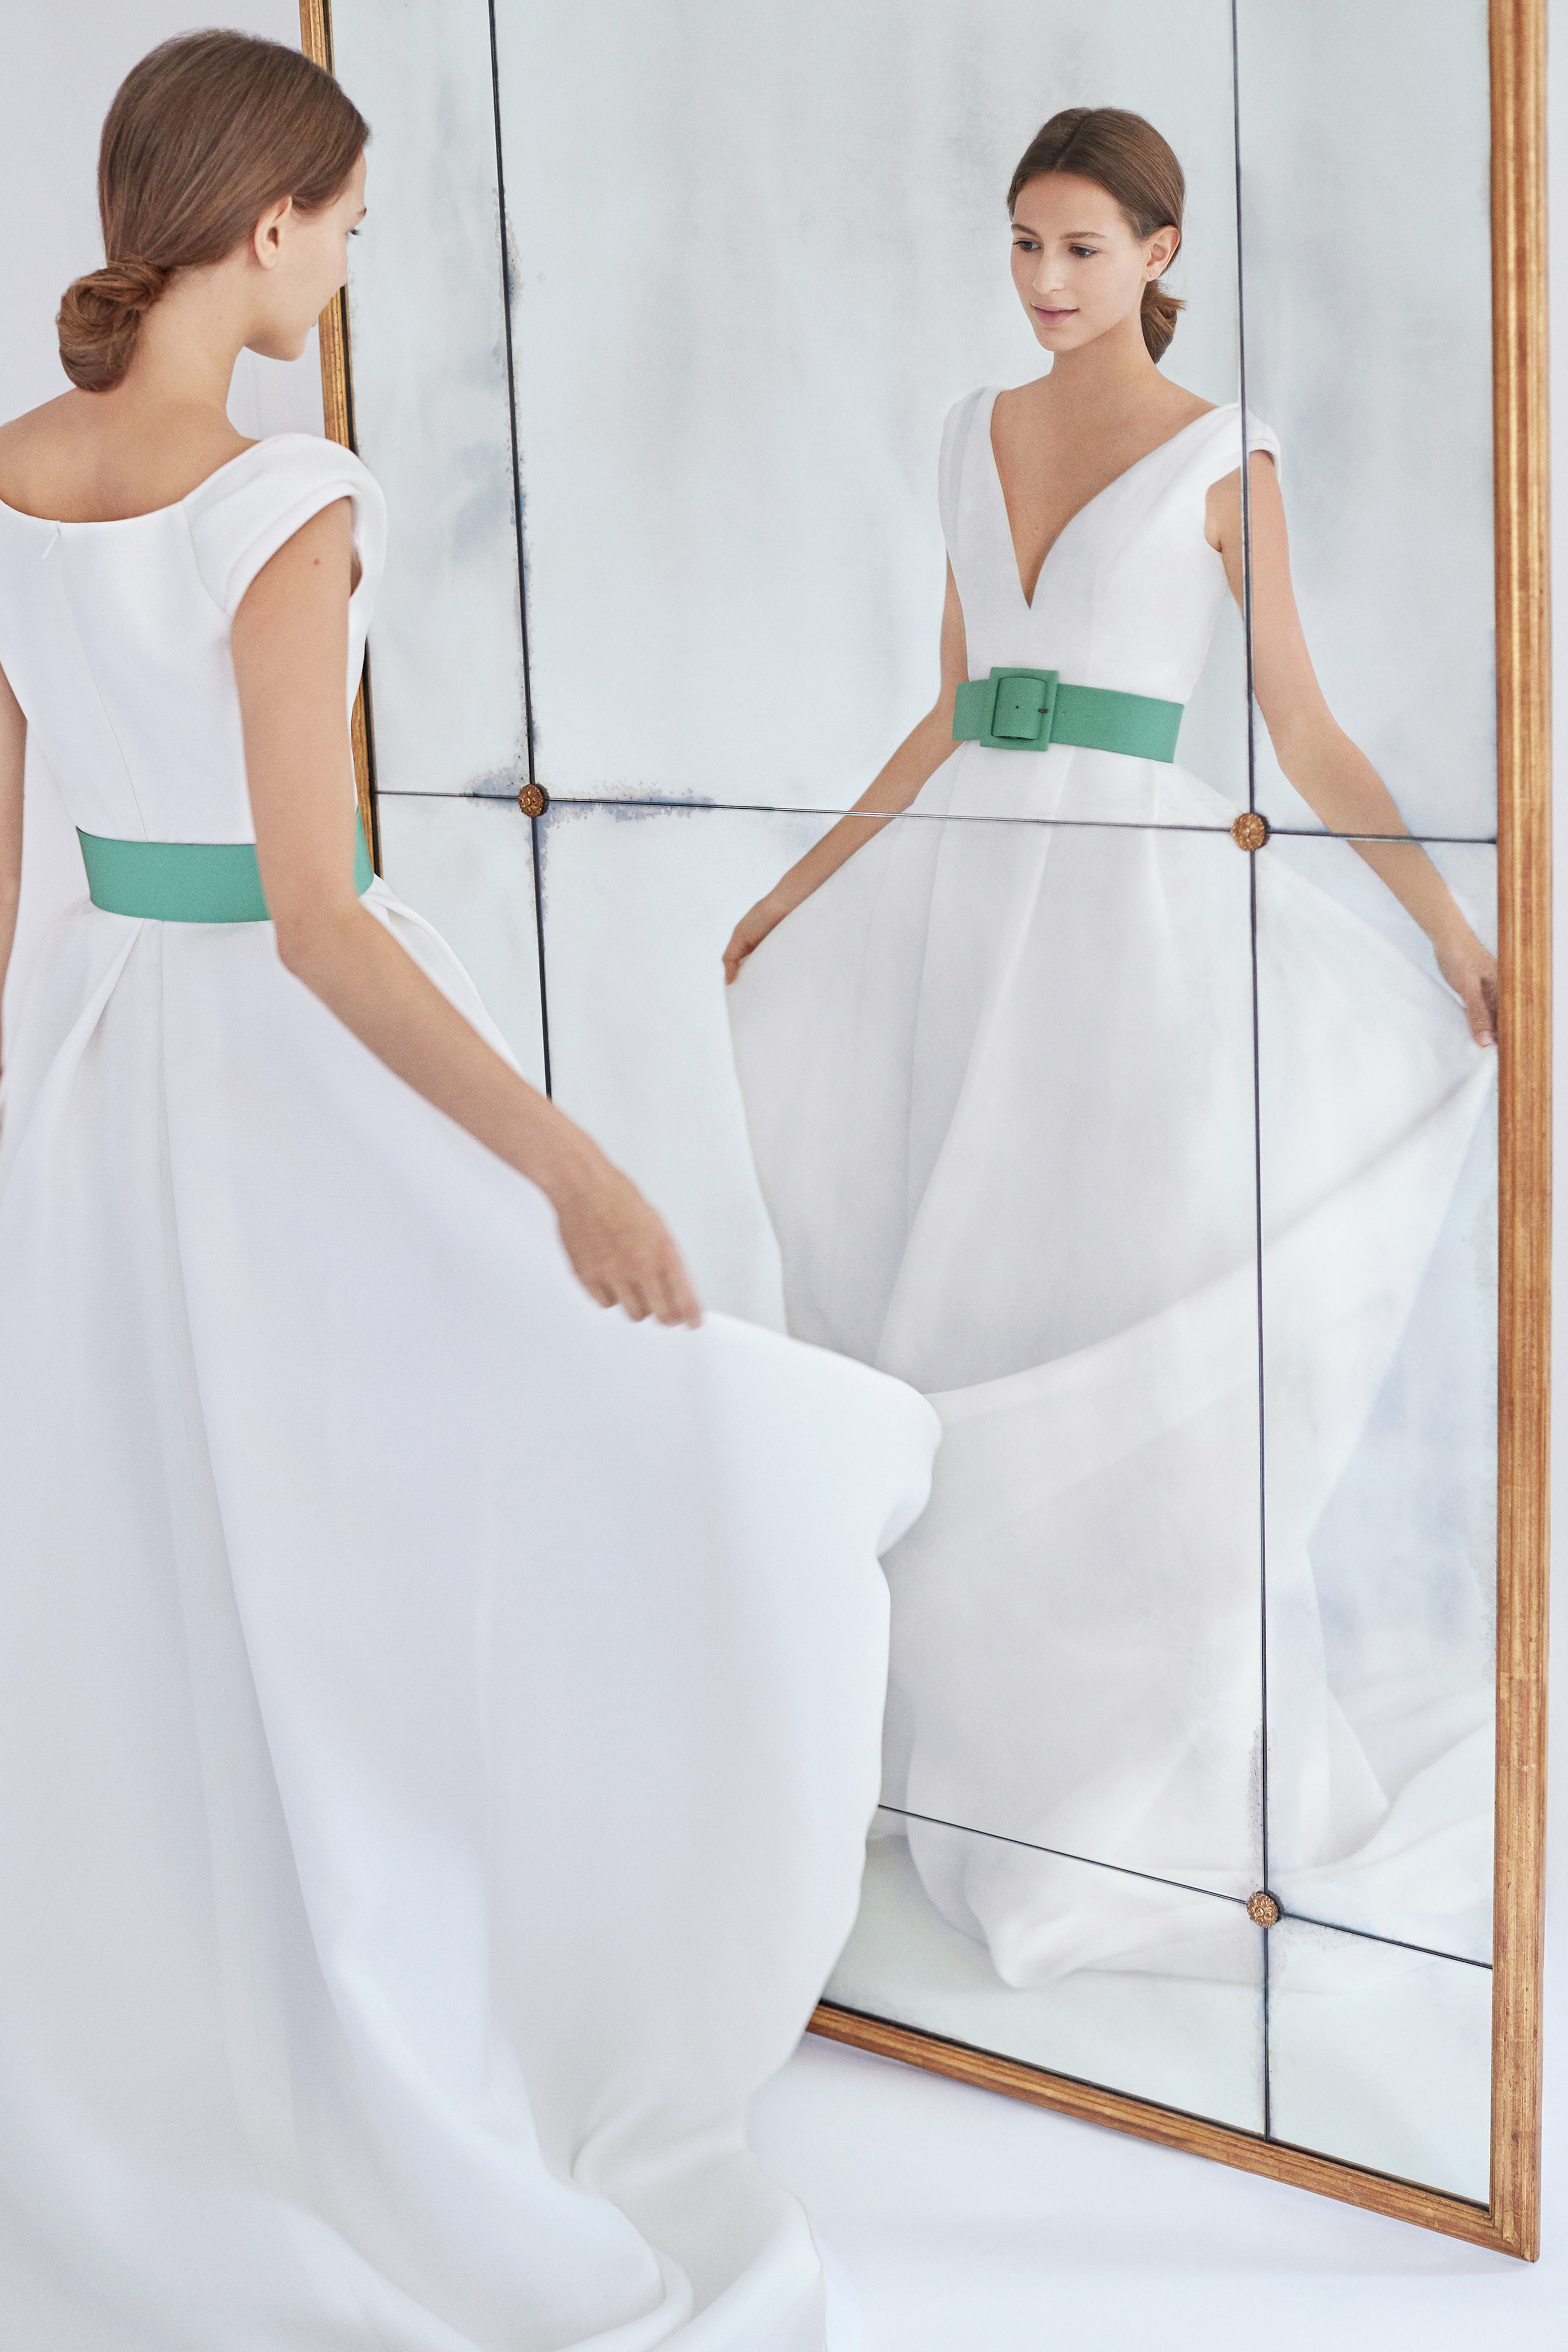 carolina herrera wedding dress fall 2018 belted v-neck